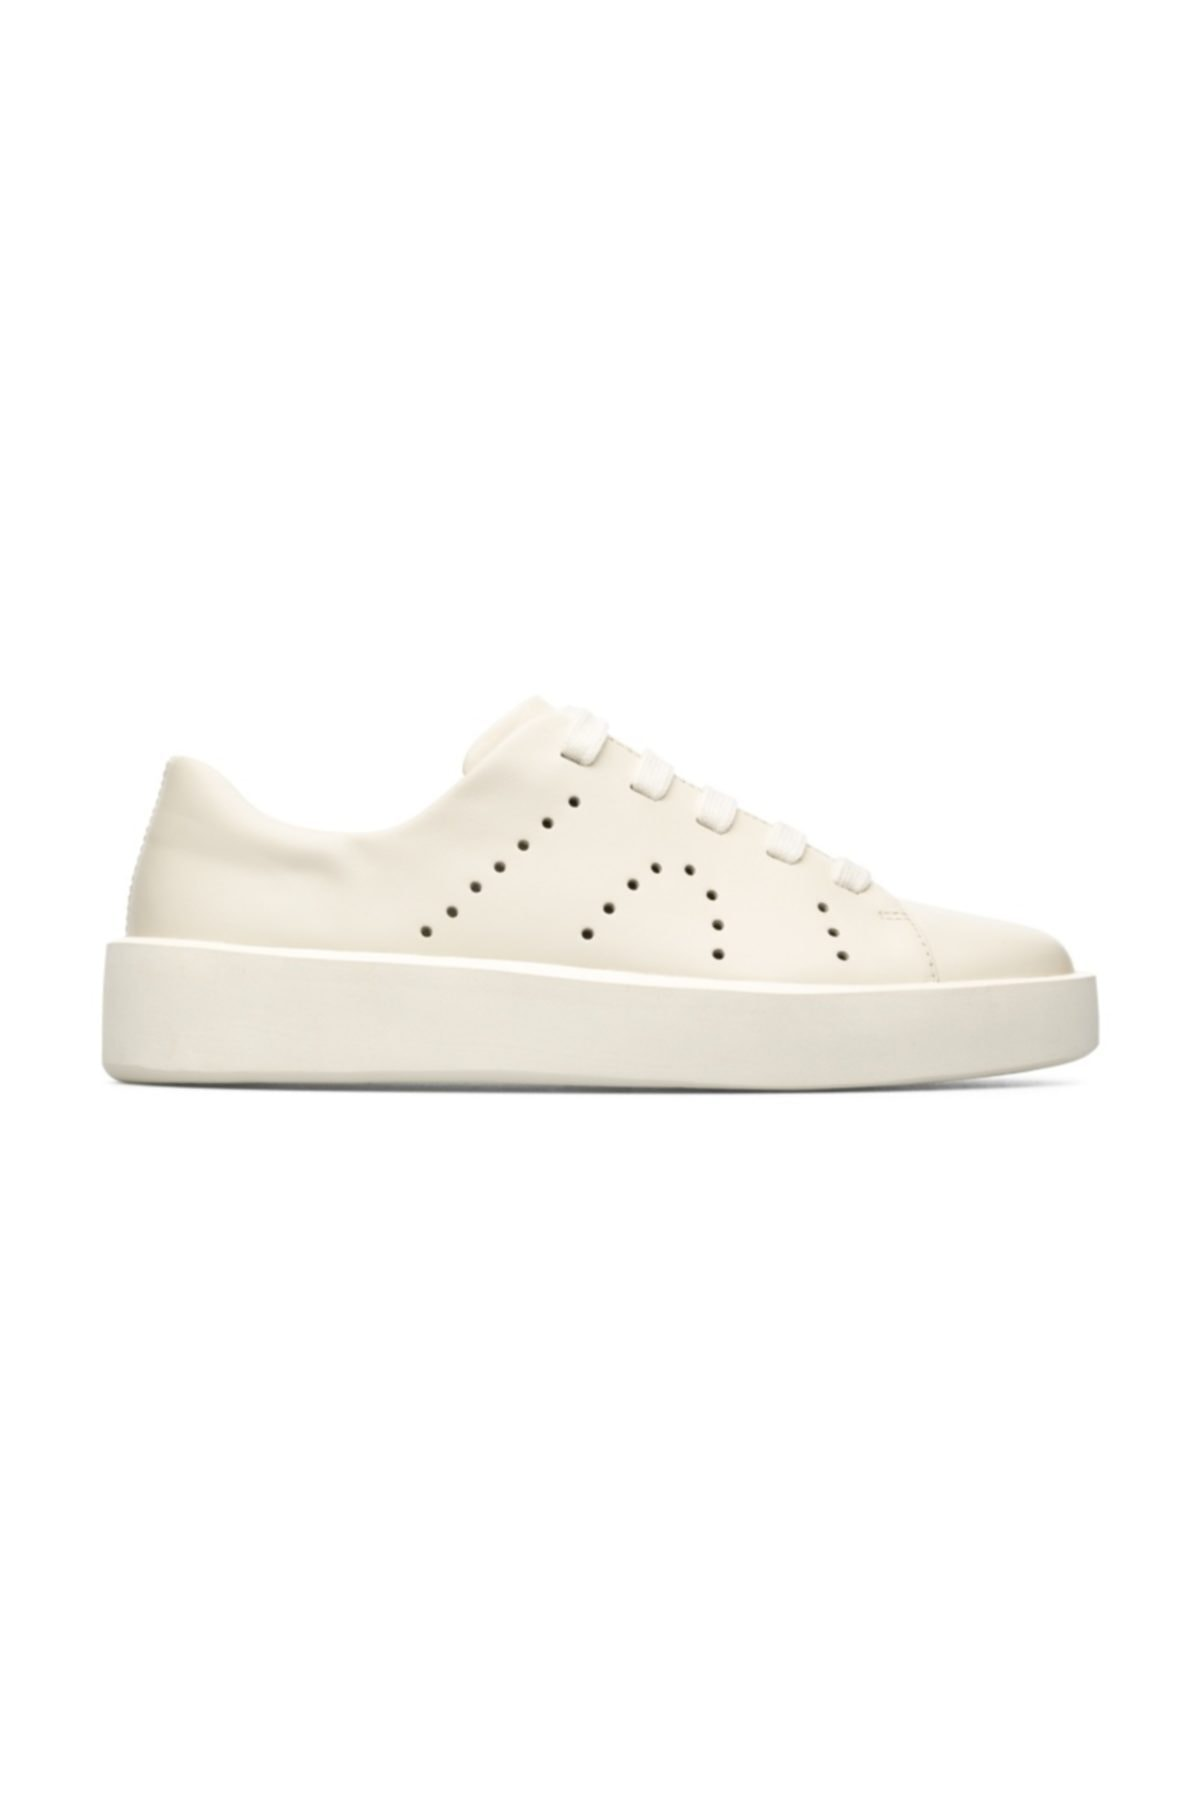 CAMPER Kadın Courb Sneaker K200828-022 1